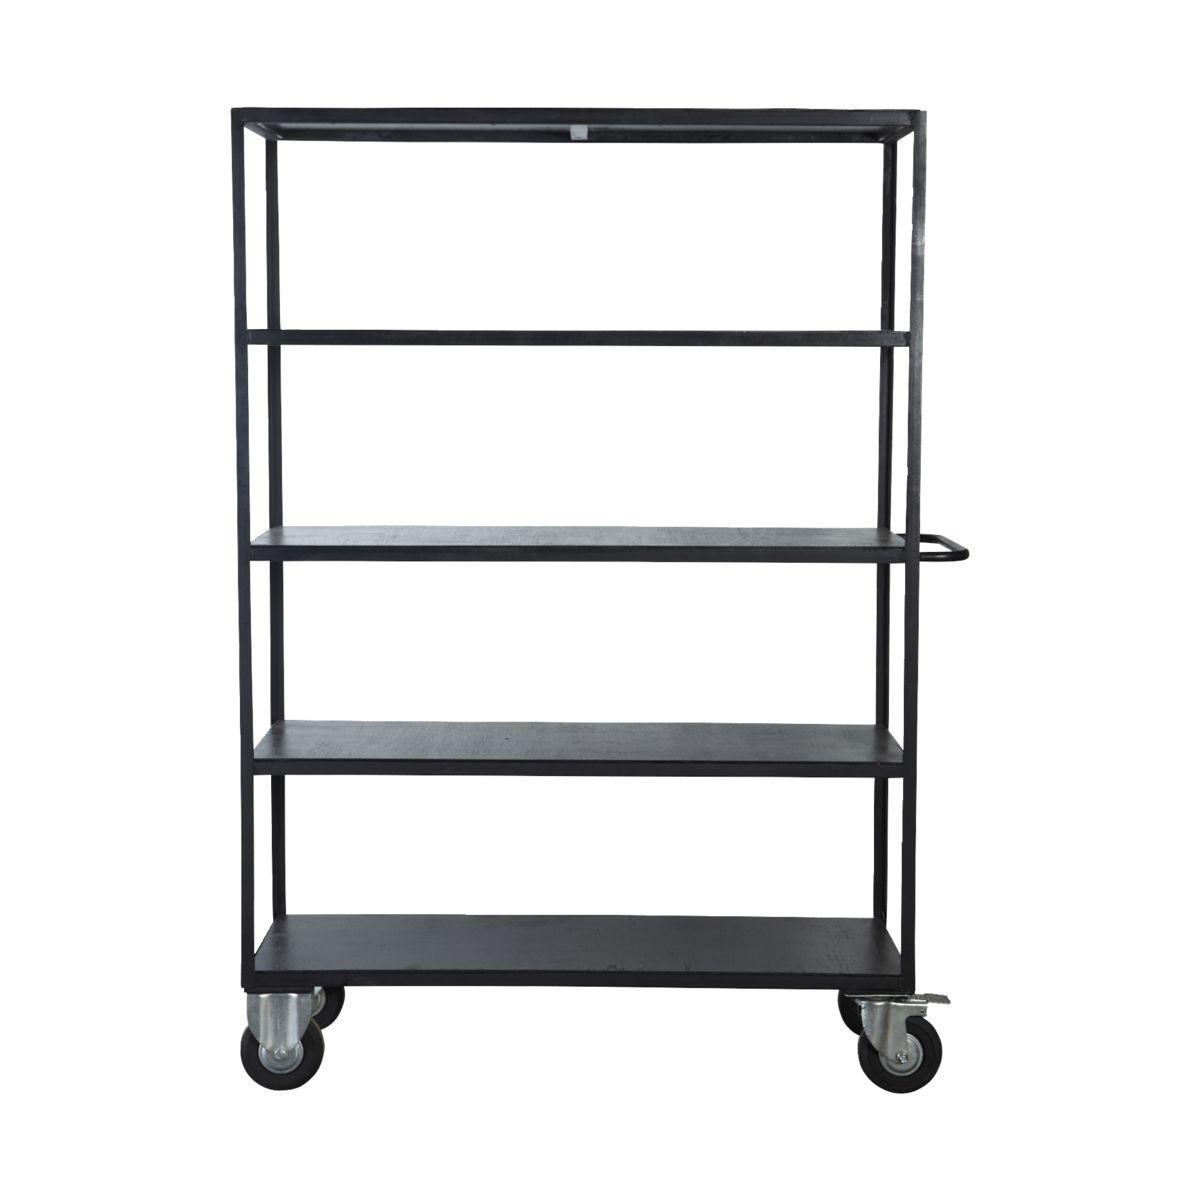 Shelving Unit 4 Wheels 175 cm | Black